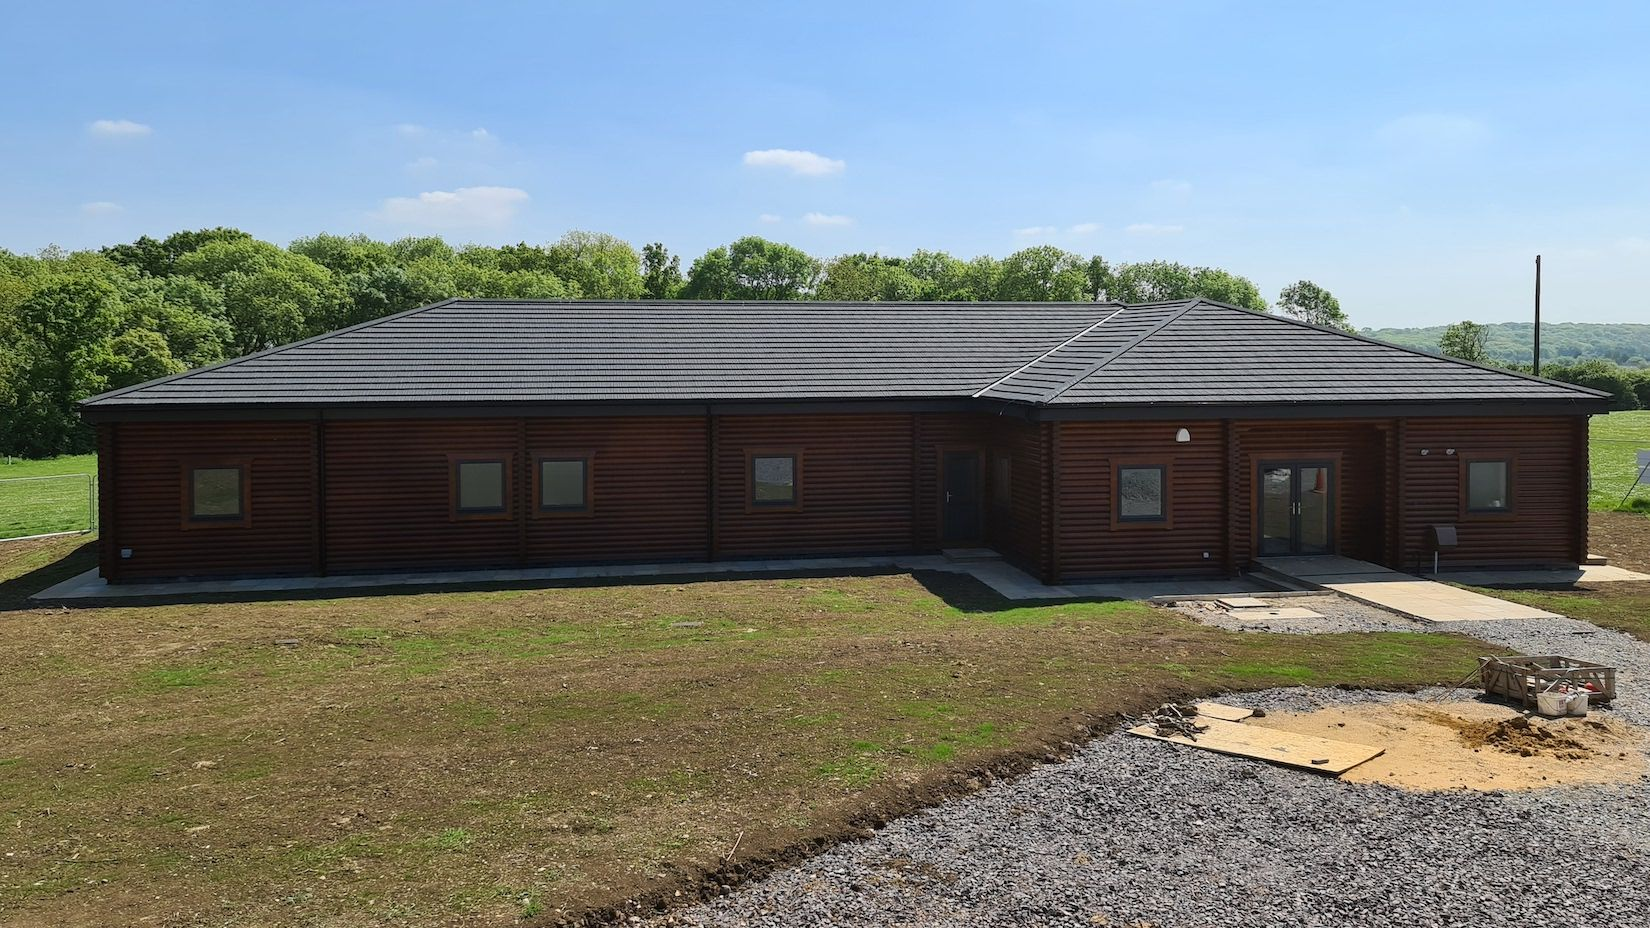 Premier Log Homes scout hut completed